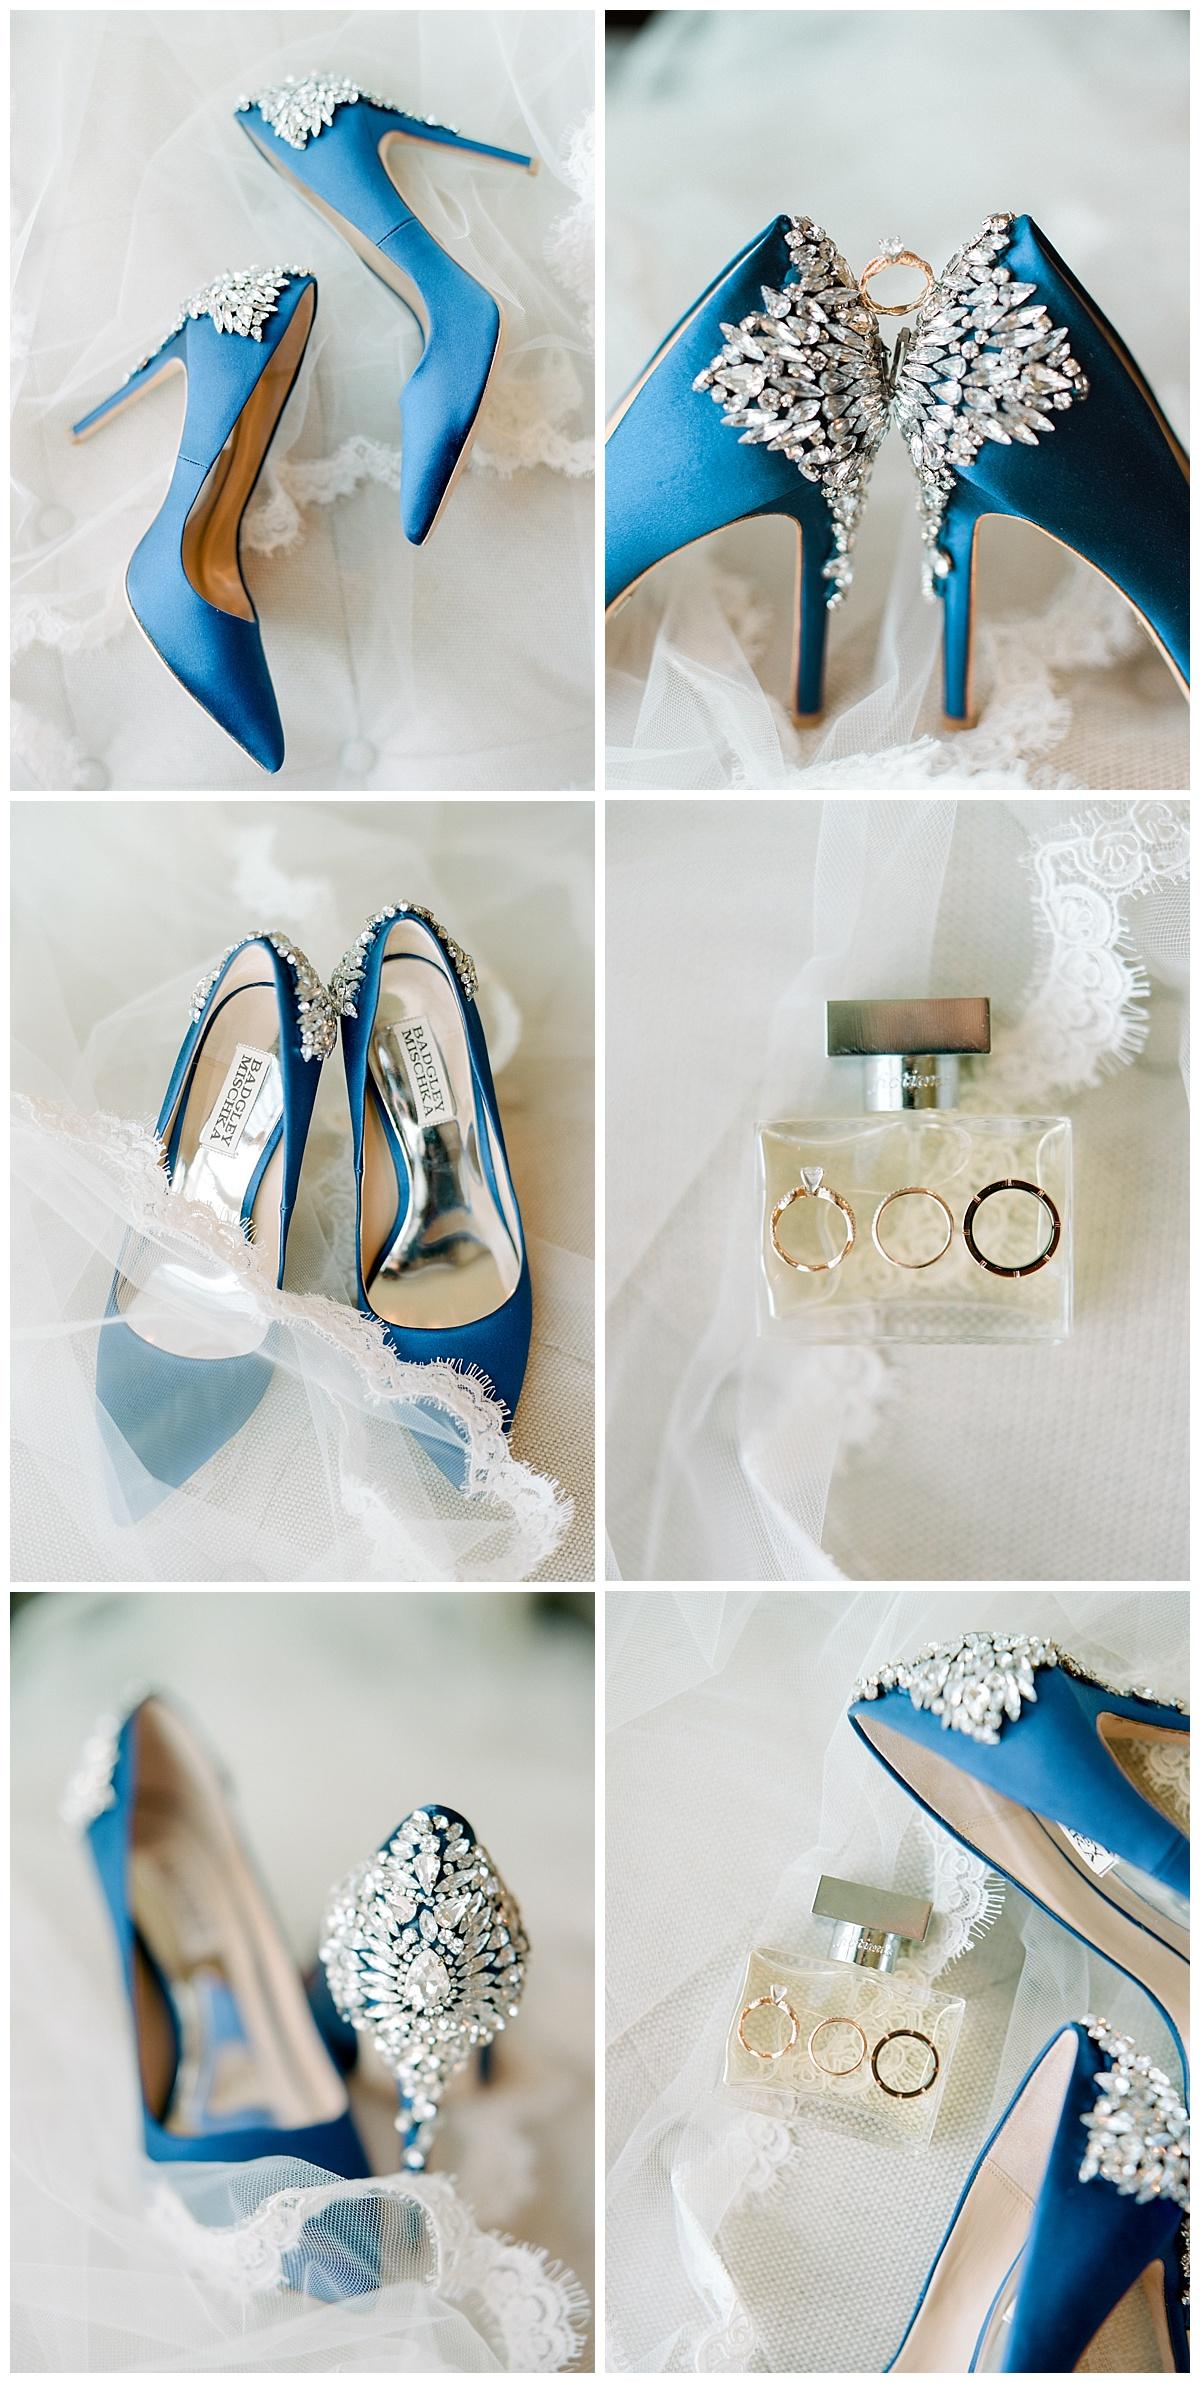 the-cotton-mill-wedding-ar-photography-1.jpg